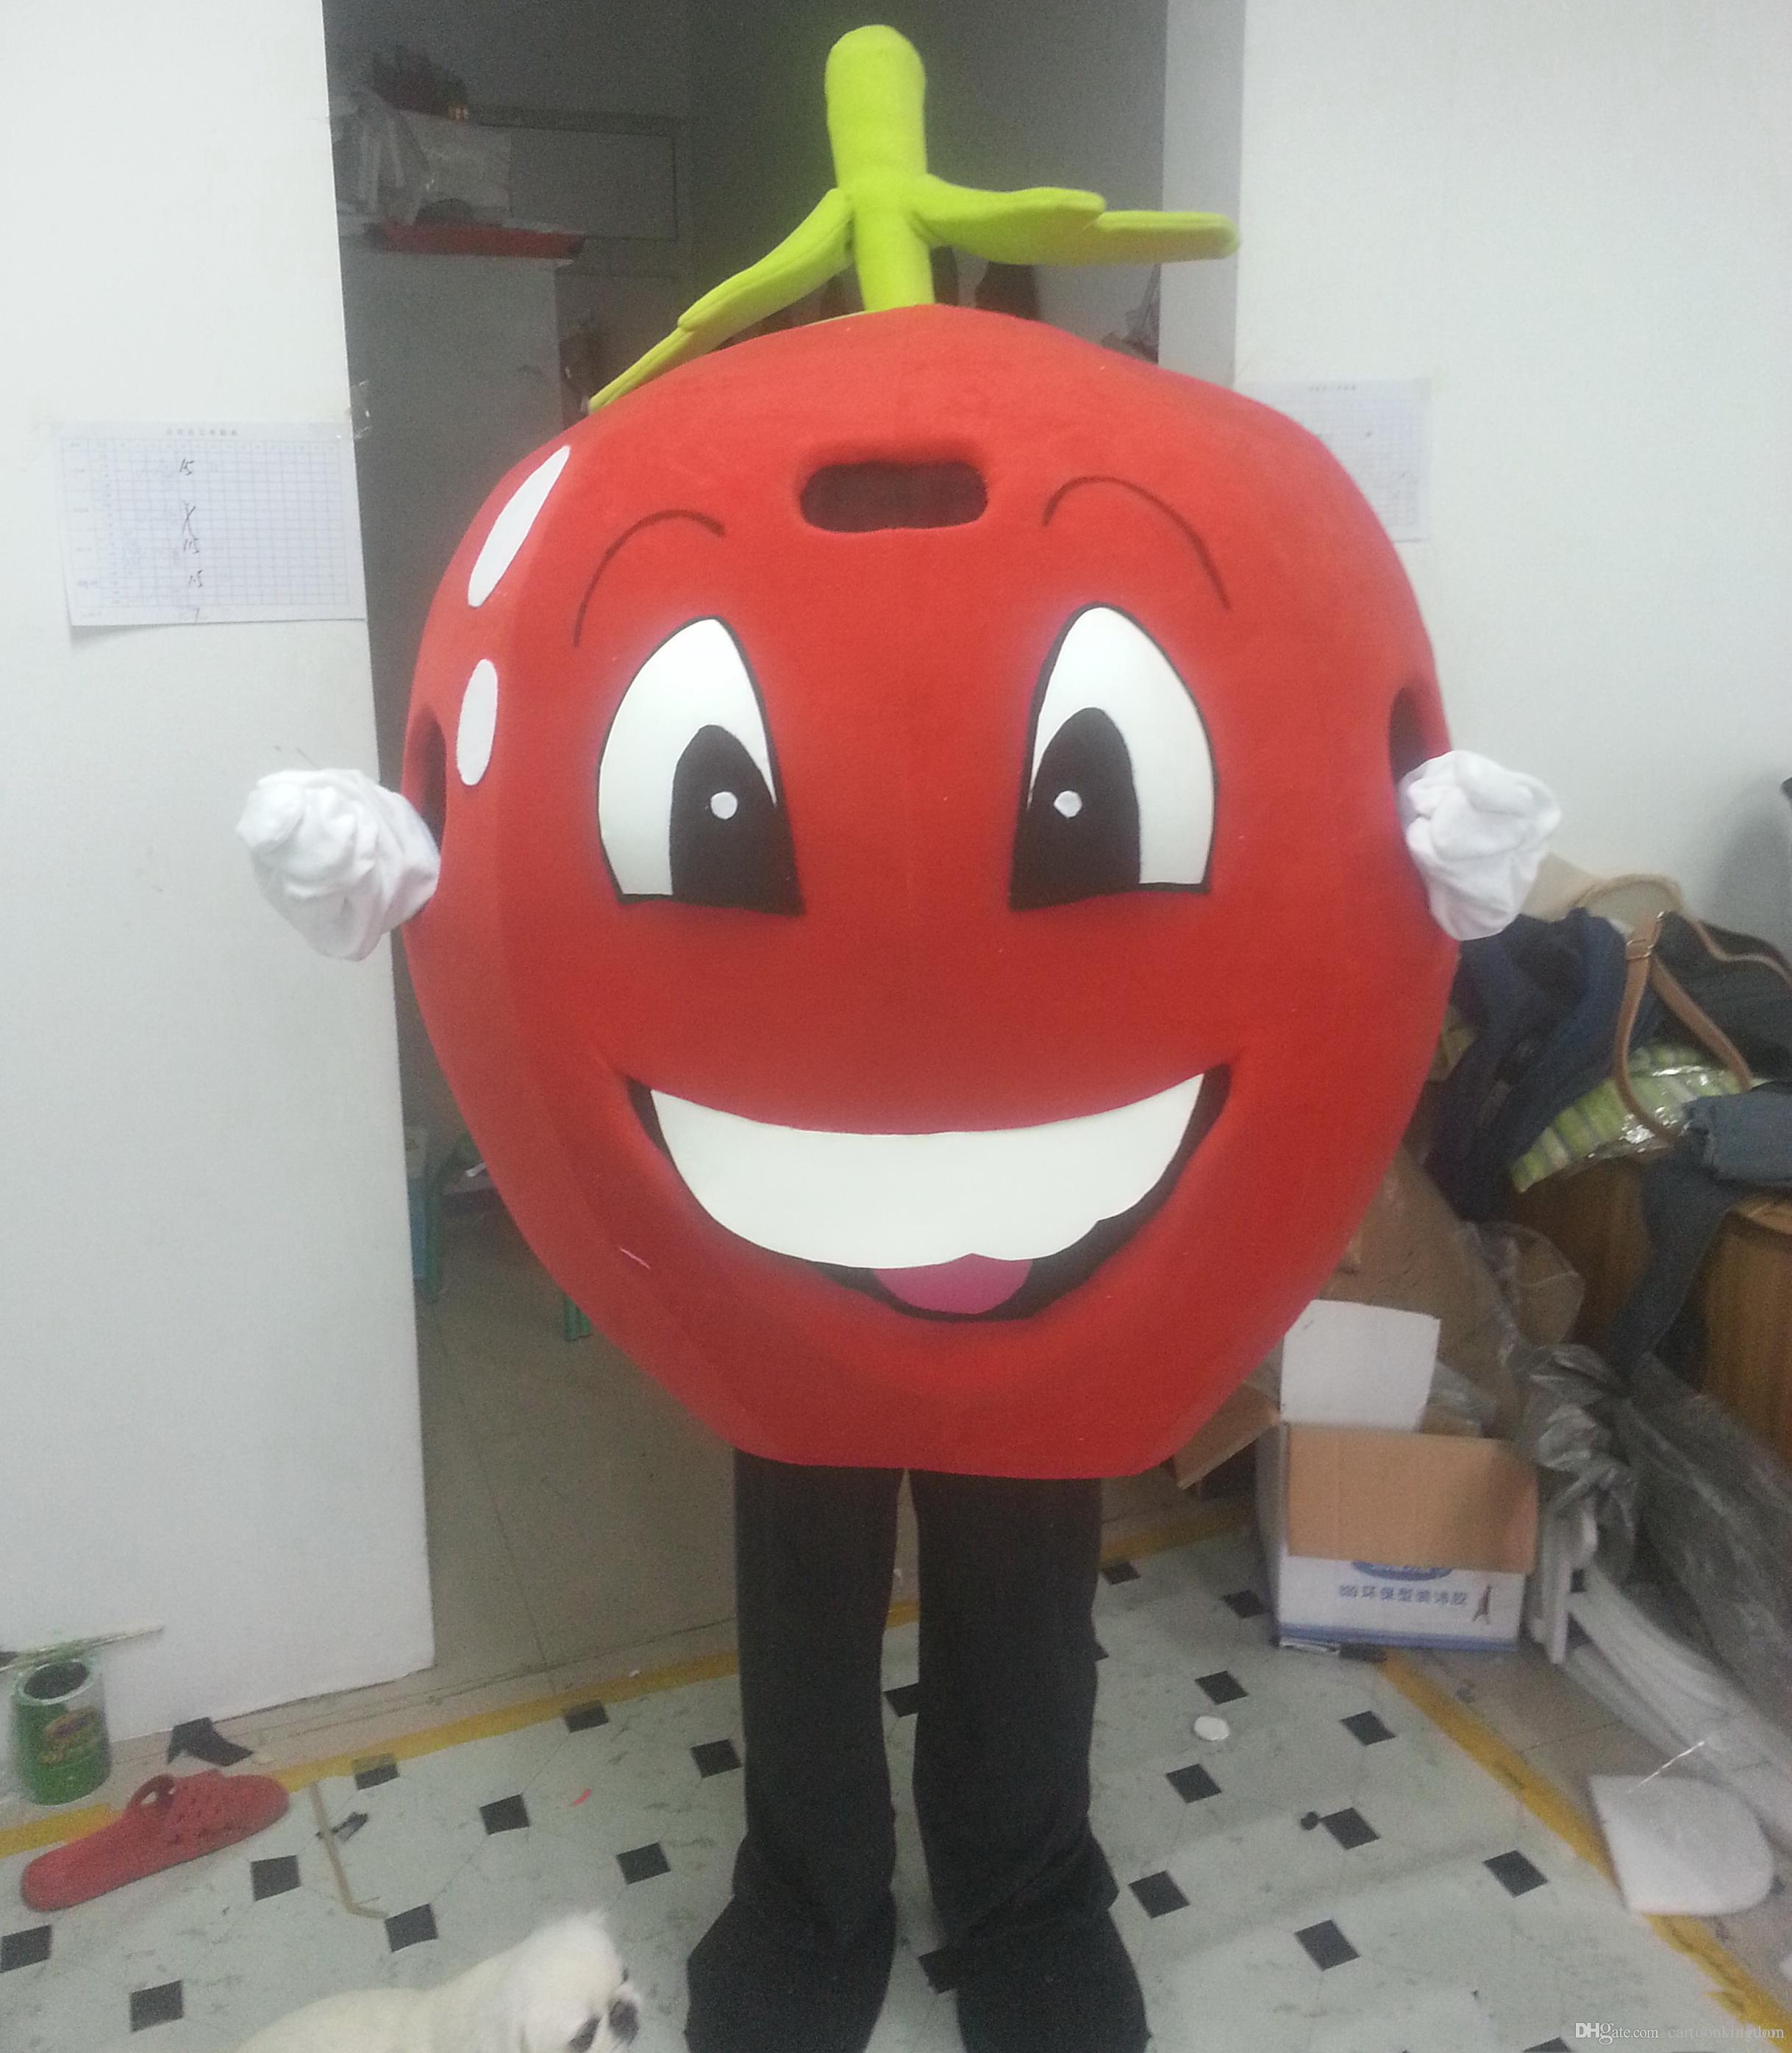 2018 Fabrika doğrudan satış EVA Malzeme Kırmızı elma Maskot Kostüm meyve Karikatür Giyim reklam